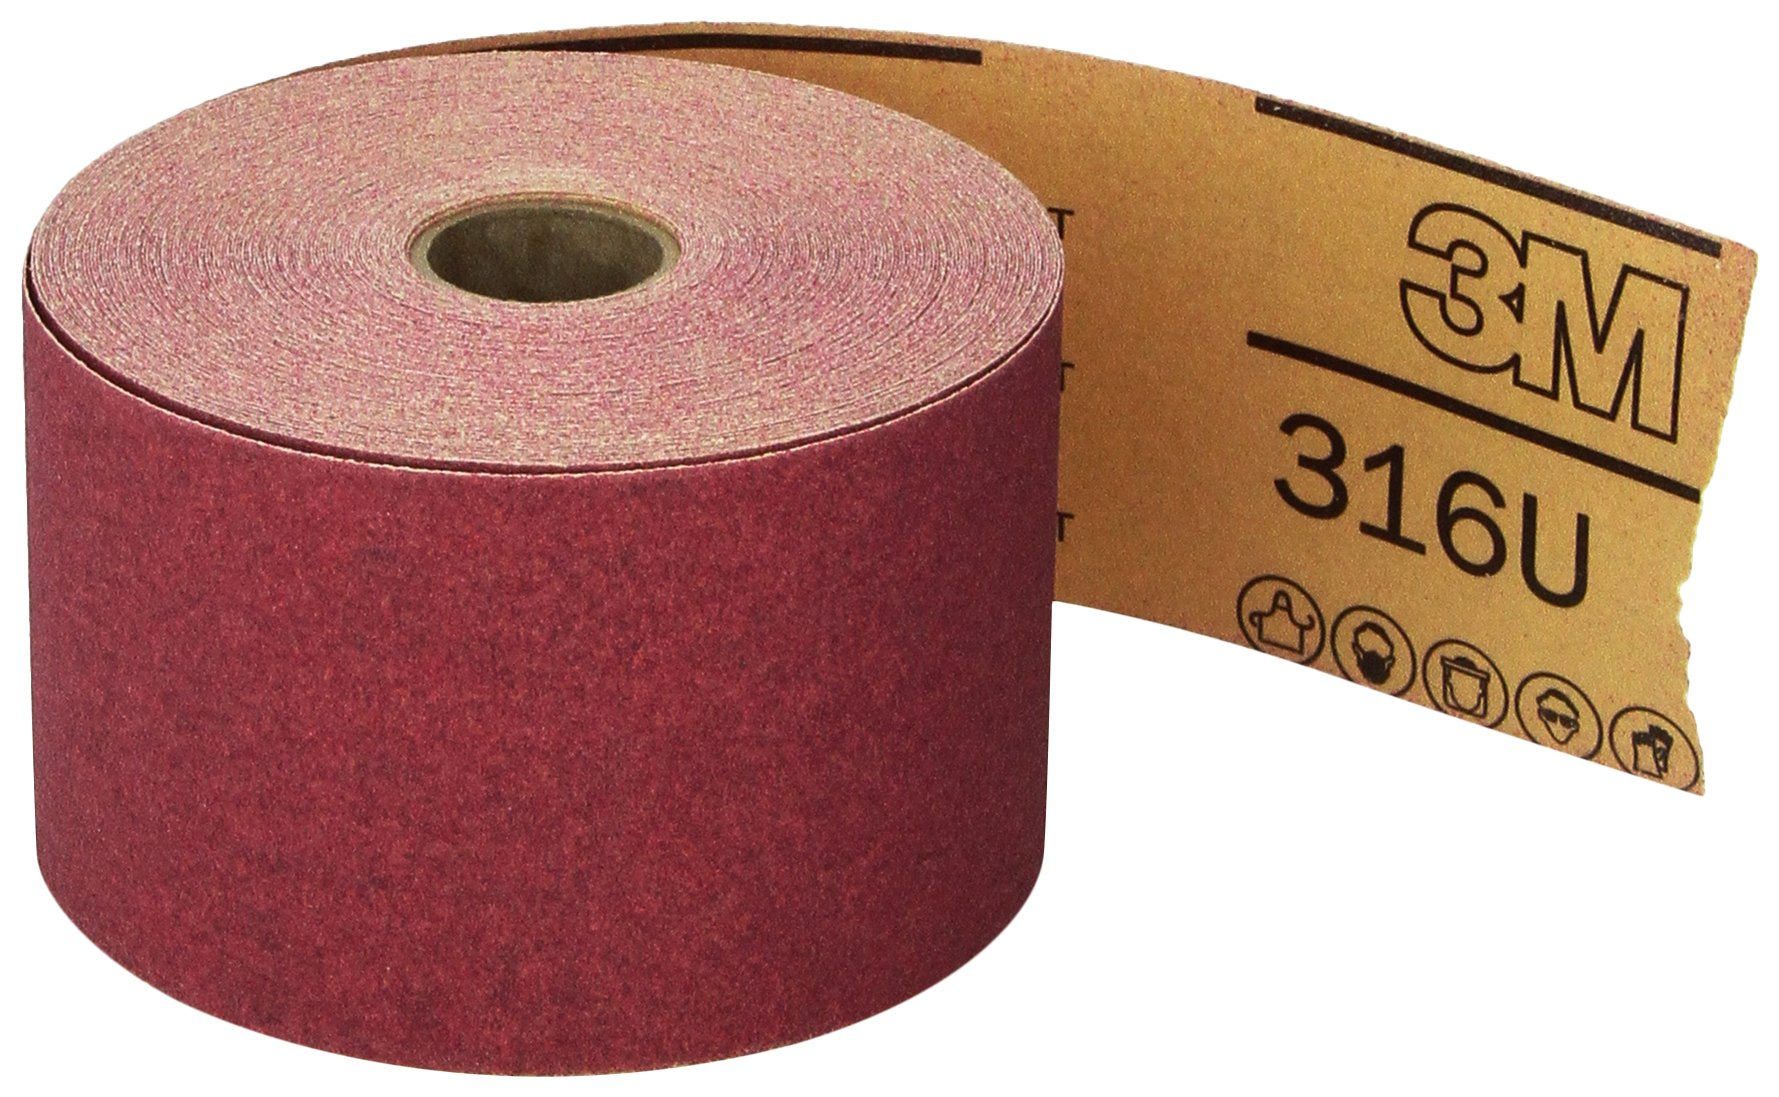 3M 01687 Stikit Red 2-3/4'' x 25 Yard P120 Grit Abrasive Sheet Roll by 3M